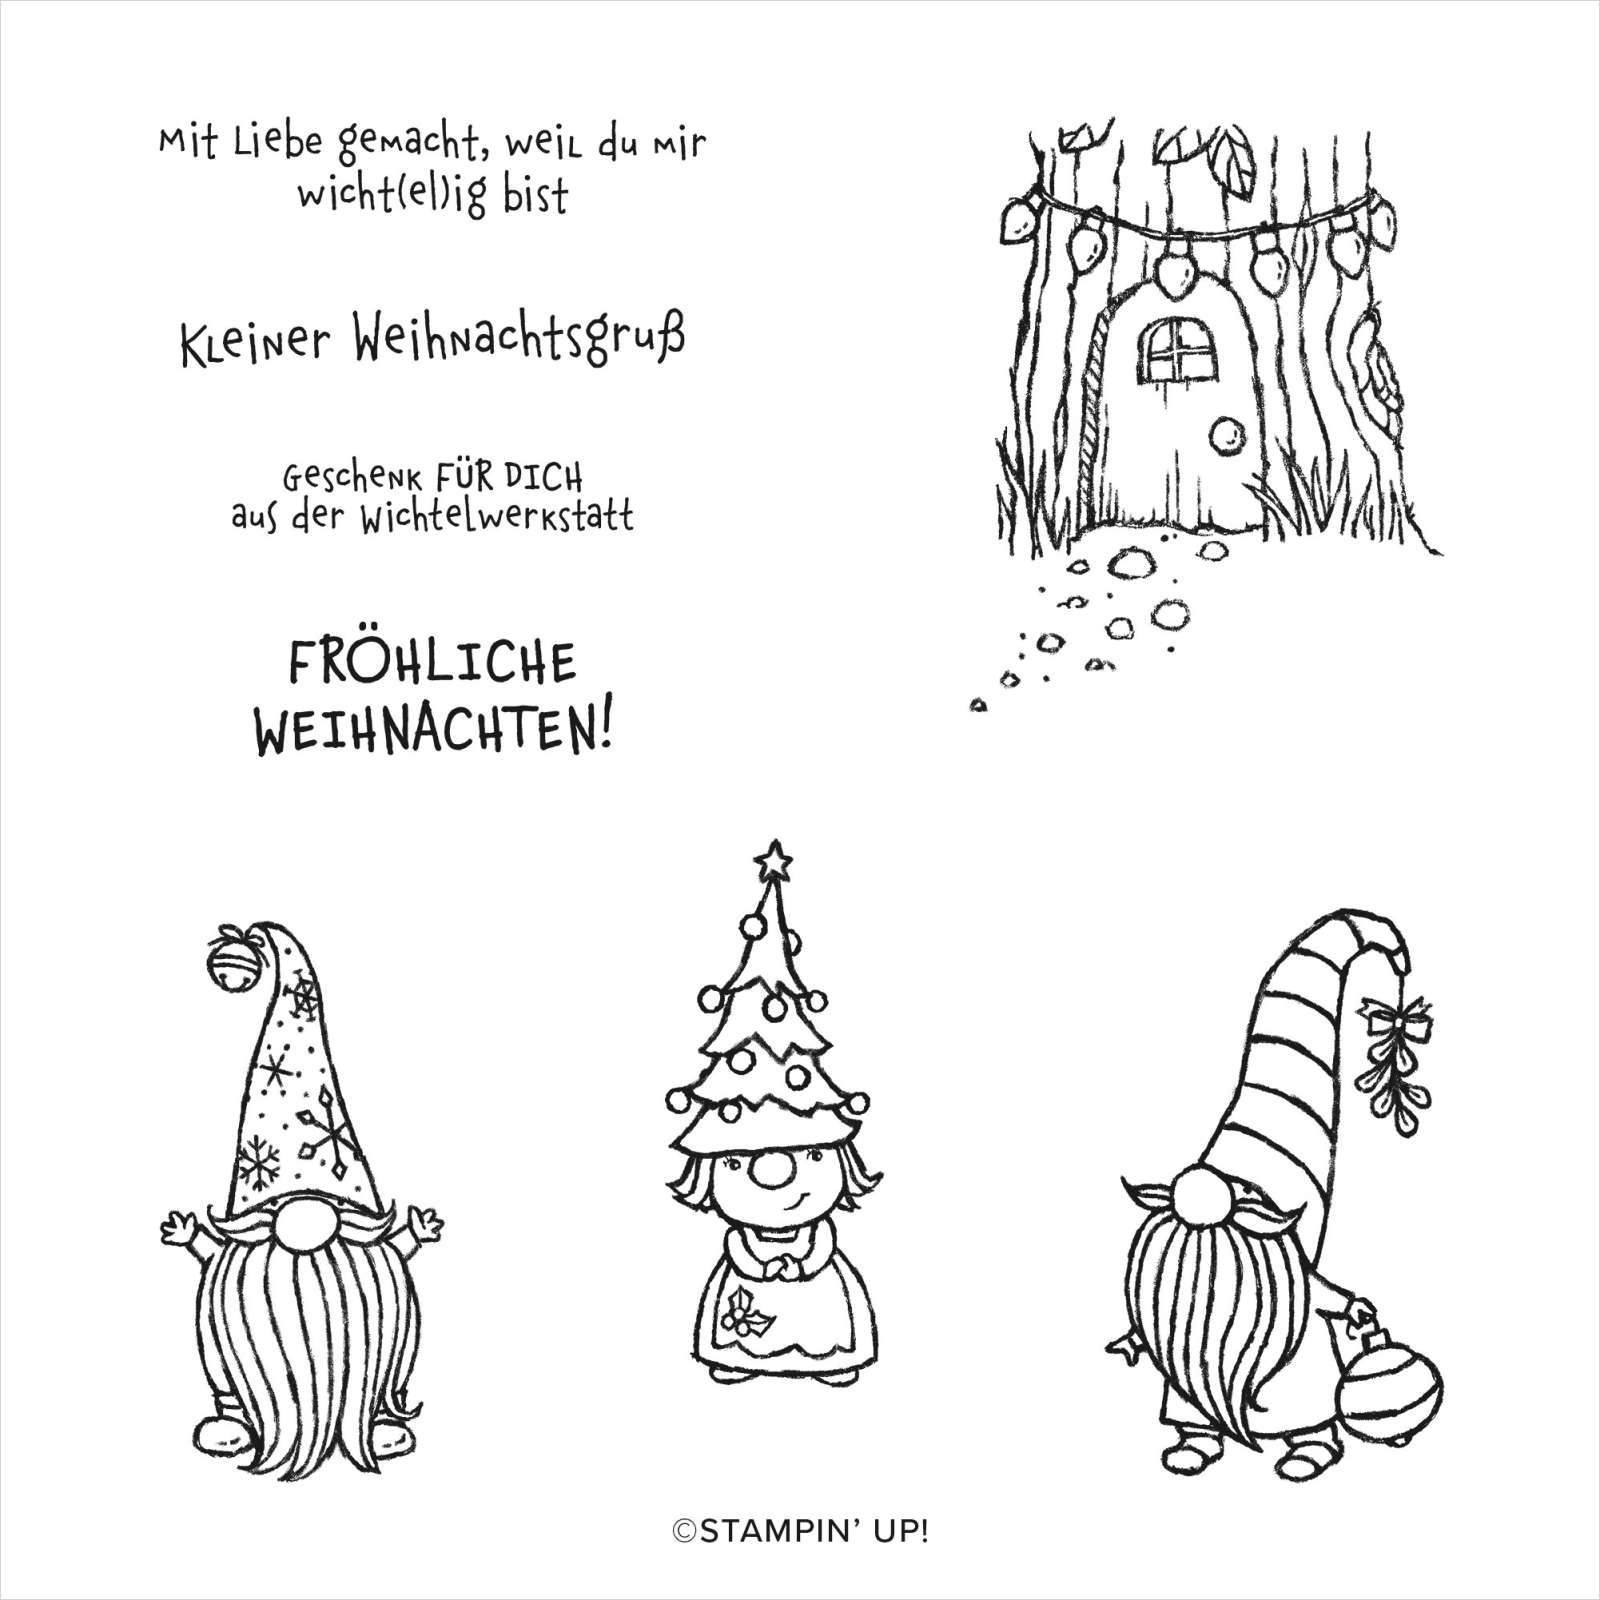 STEMPELSET ABLÖSBAR WICHTELWEIHNACHT (DEUTSCH)